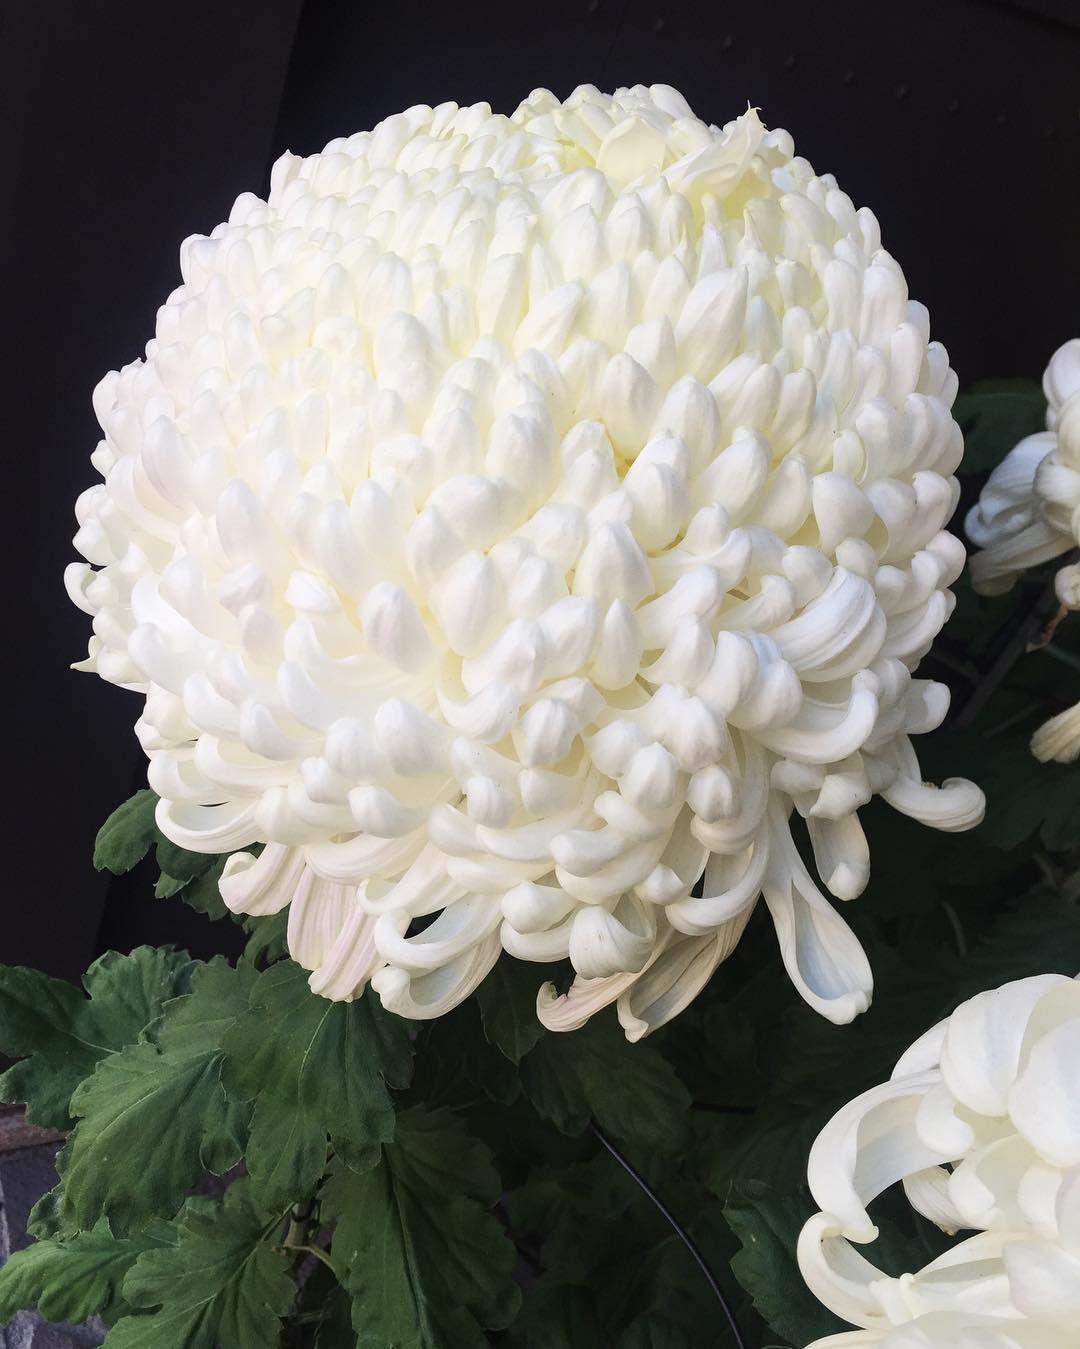 December 8th Giant Snowball Chrysanthemums Still On The Scene White Chrysanthemum Chrysanthemum Flowers